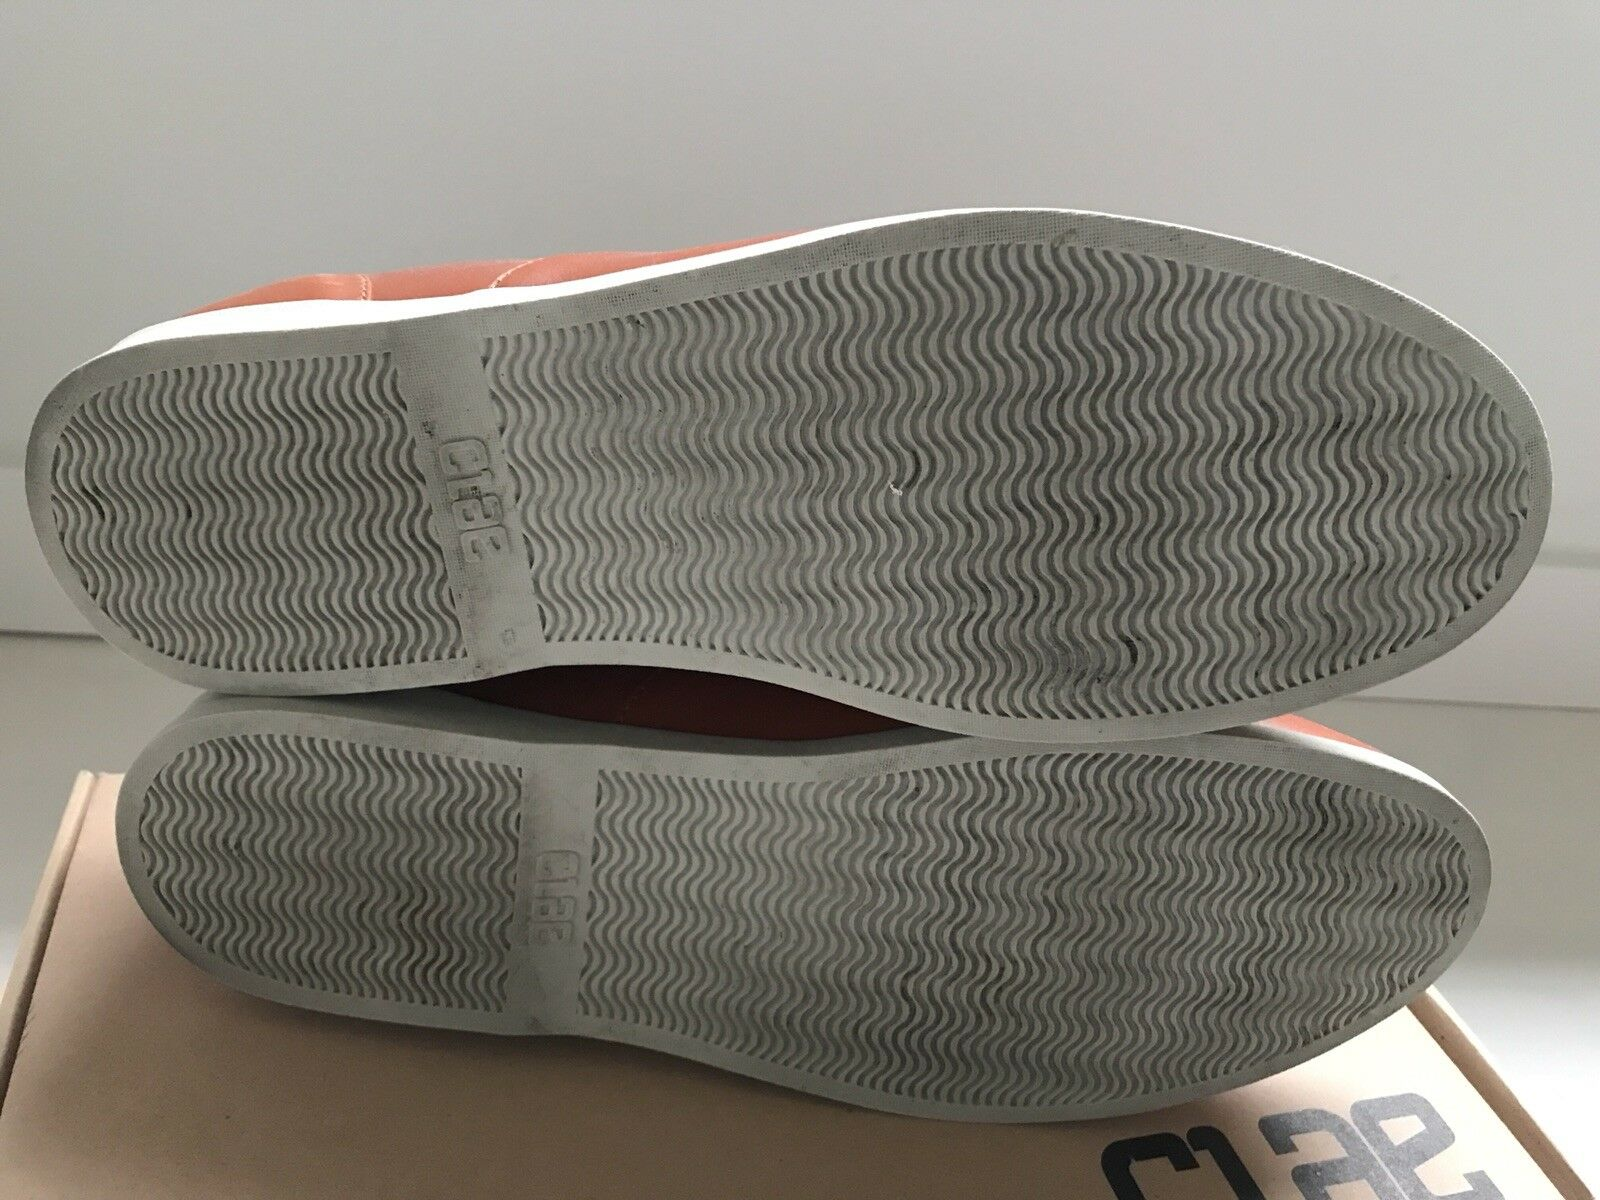 CLAE HOCKNEY CARAMEL LEATHER Model Shoes US MENS 12 Model LEATHER CLA01254 d99fba